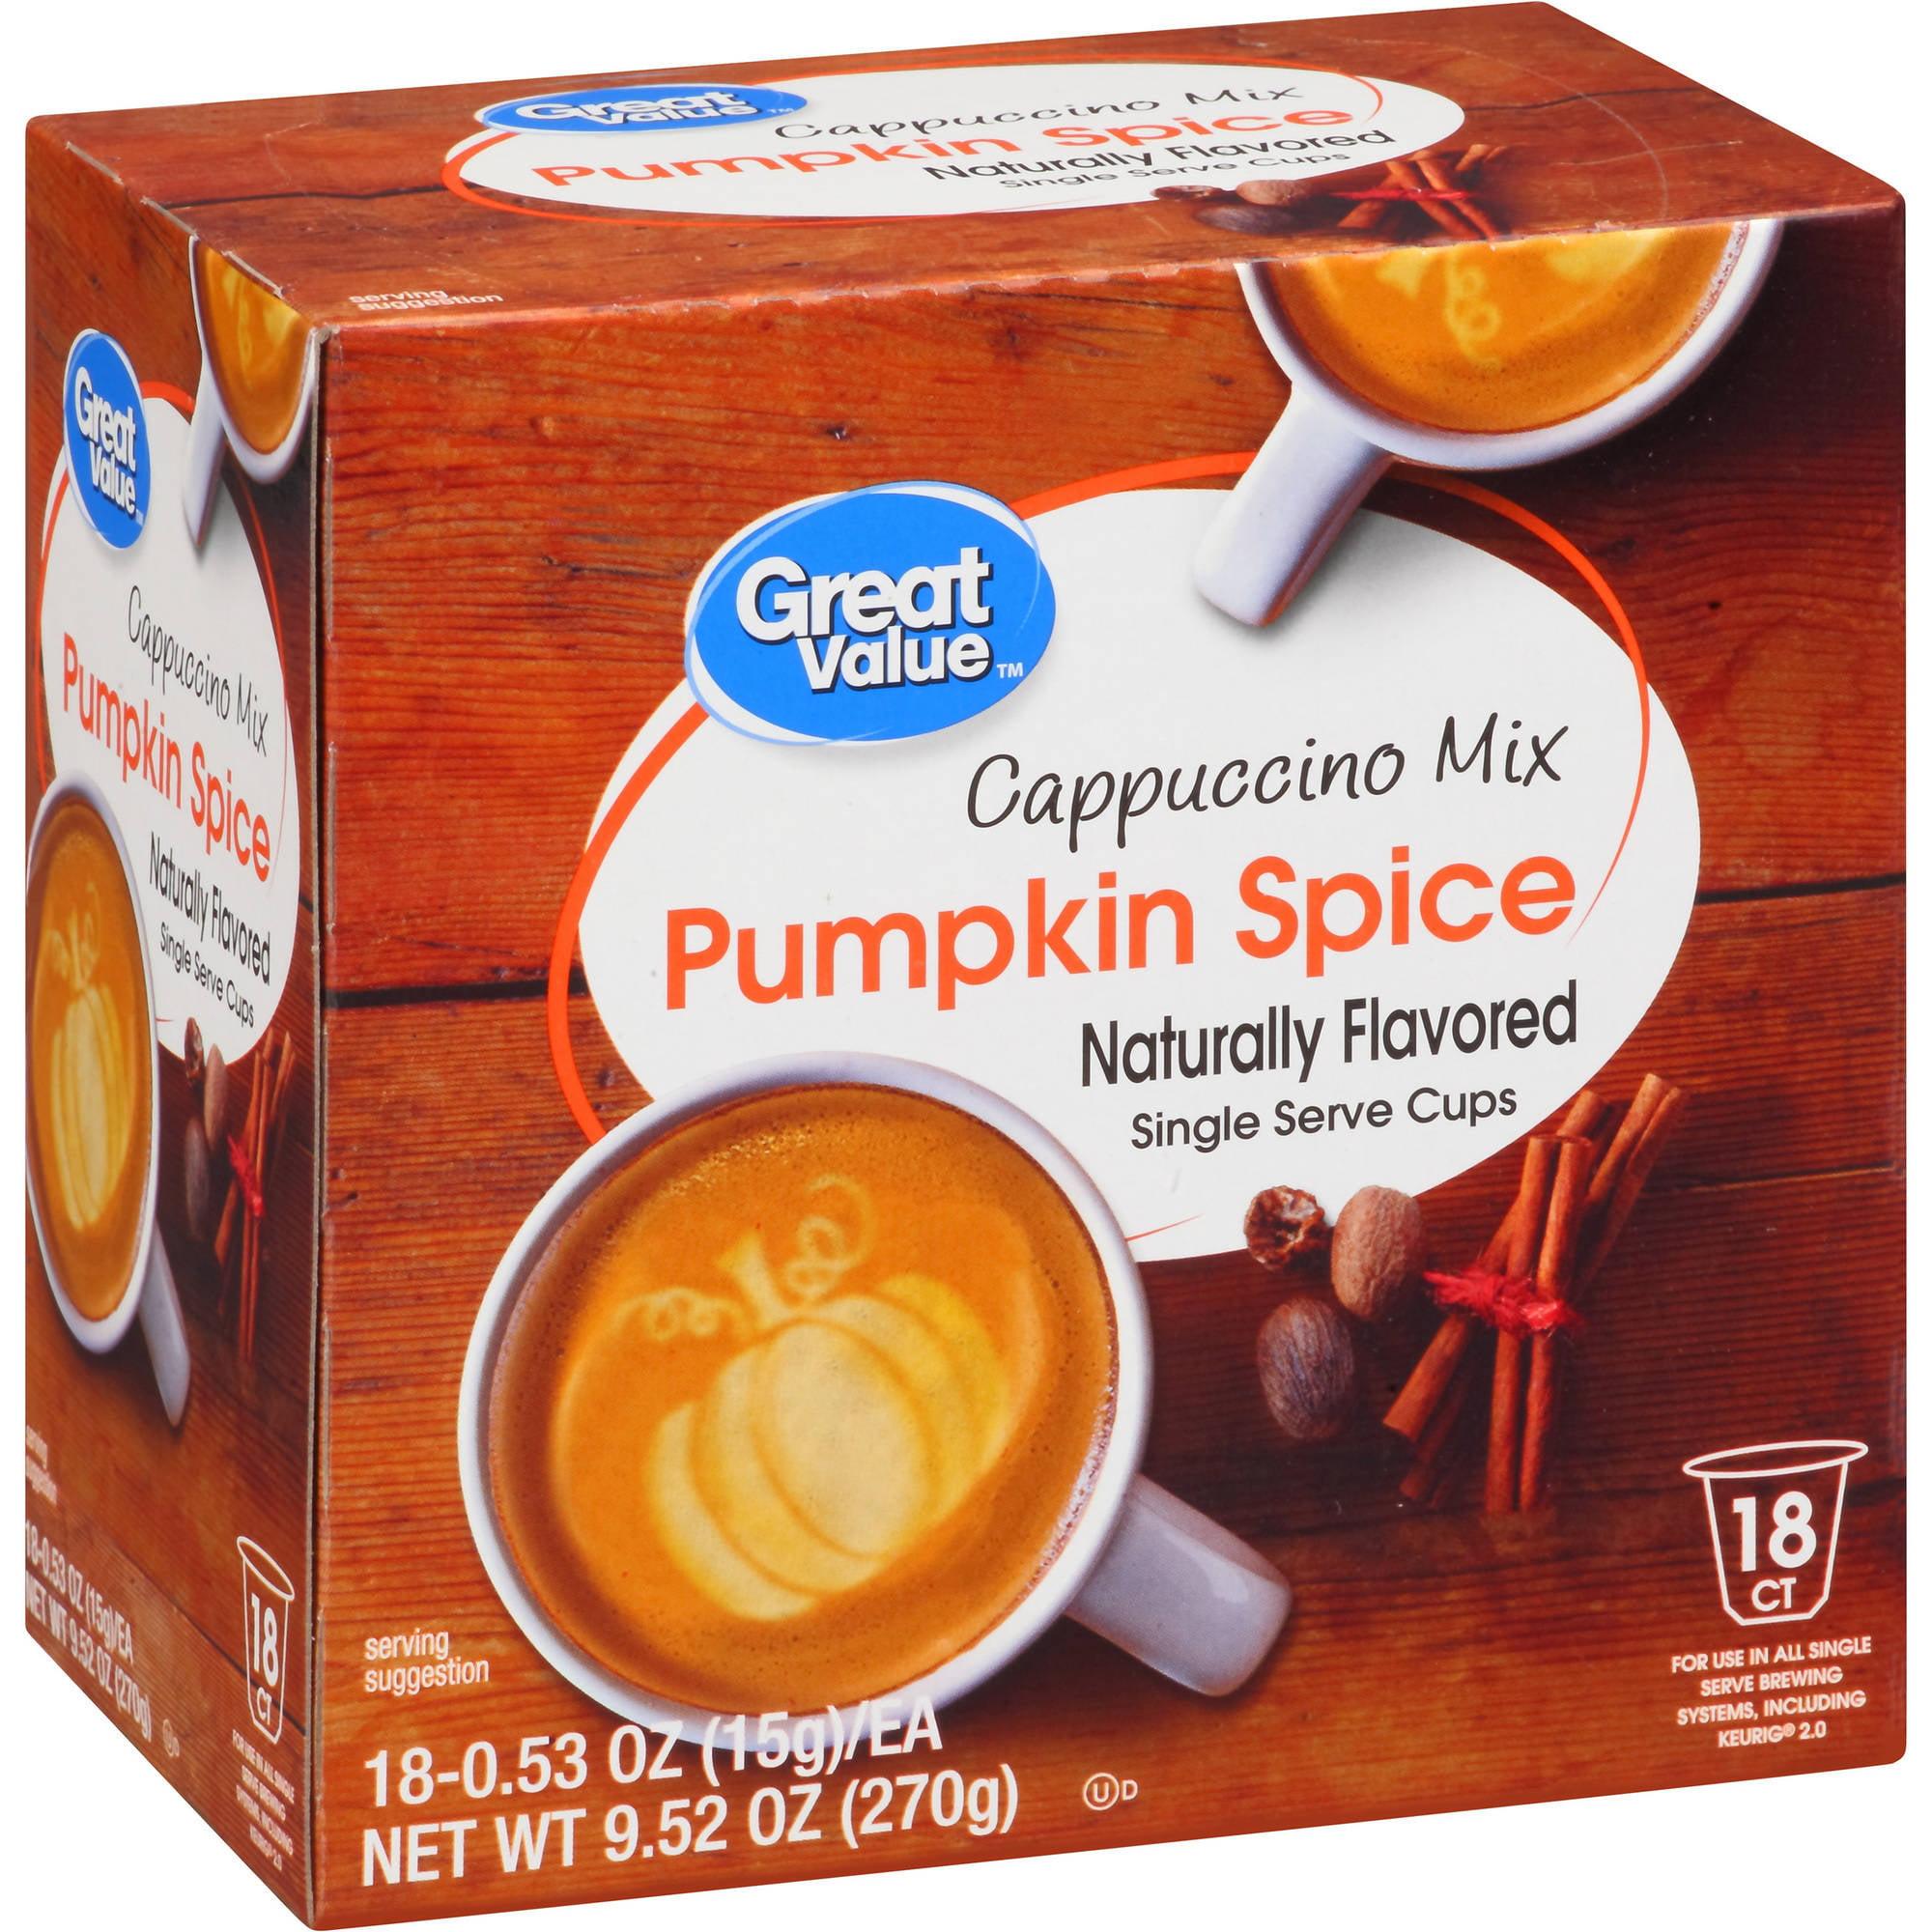 Great Value Pumpkin Spice Cappuccino keurig coffee pods